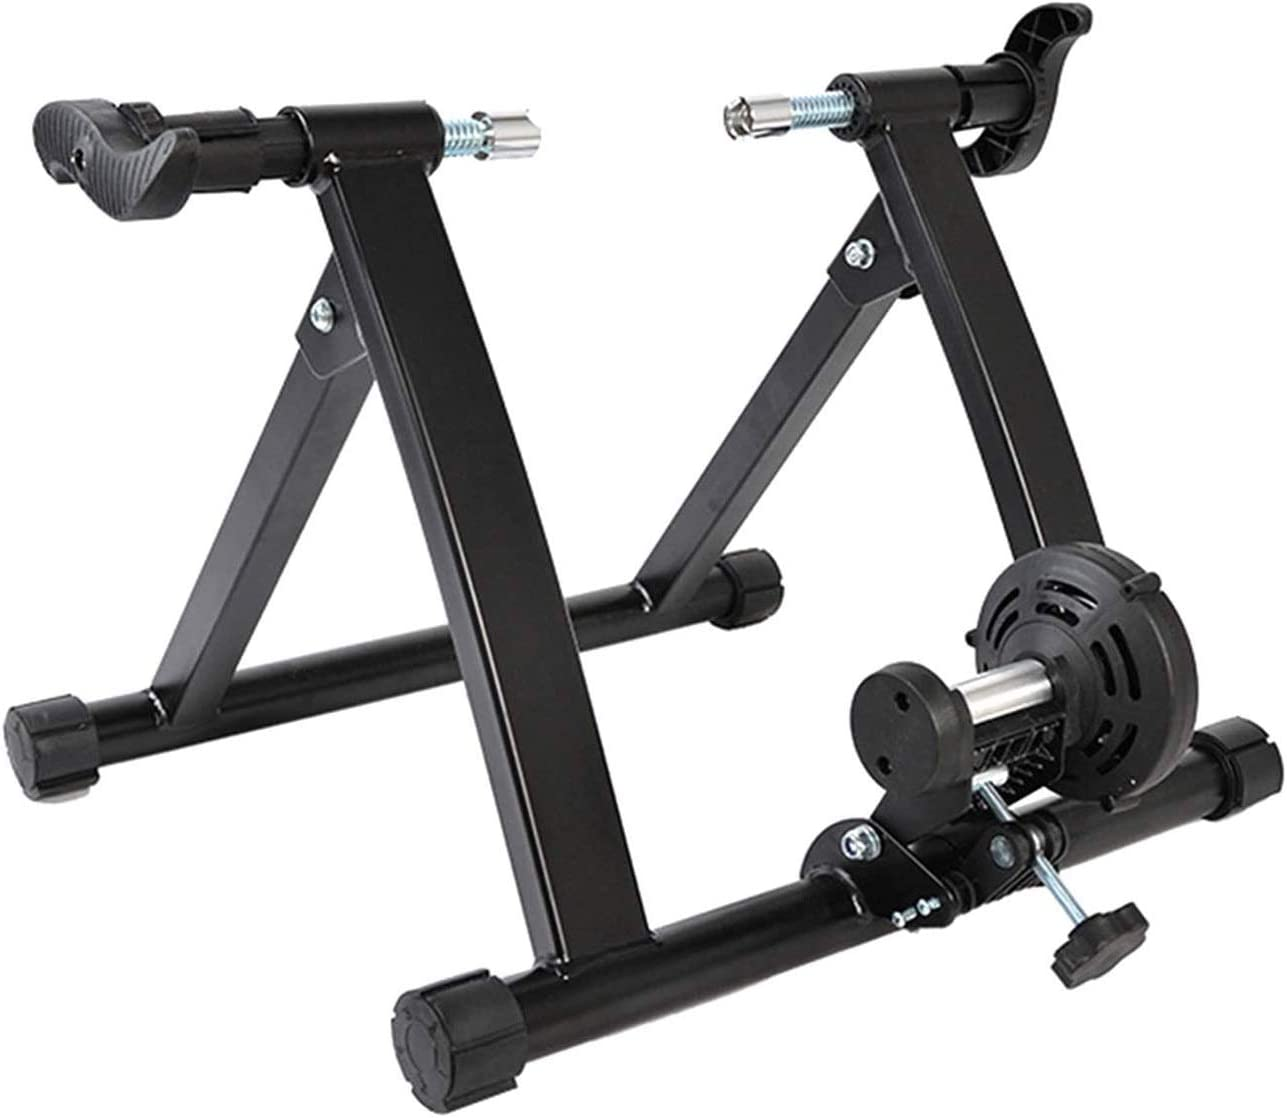 SJNQJJ Bike Trainer Stand Ac Ranking TOP3 Racks Stands Gifts Cycling